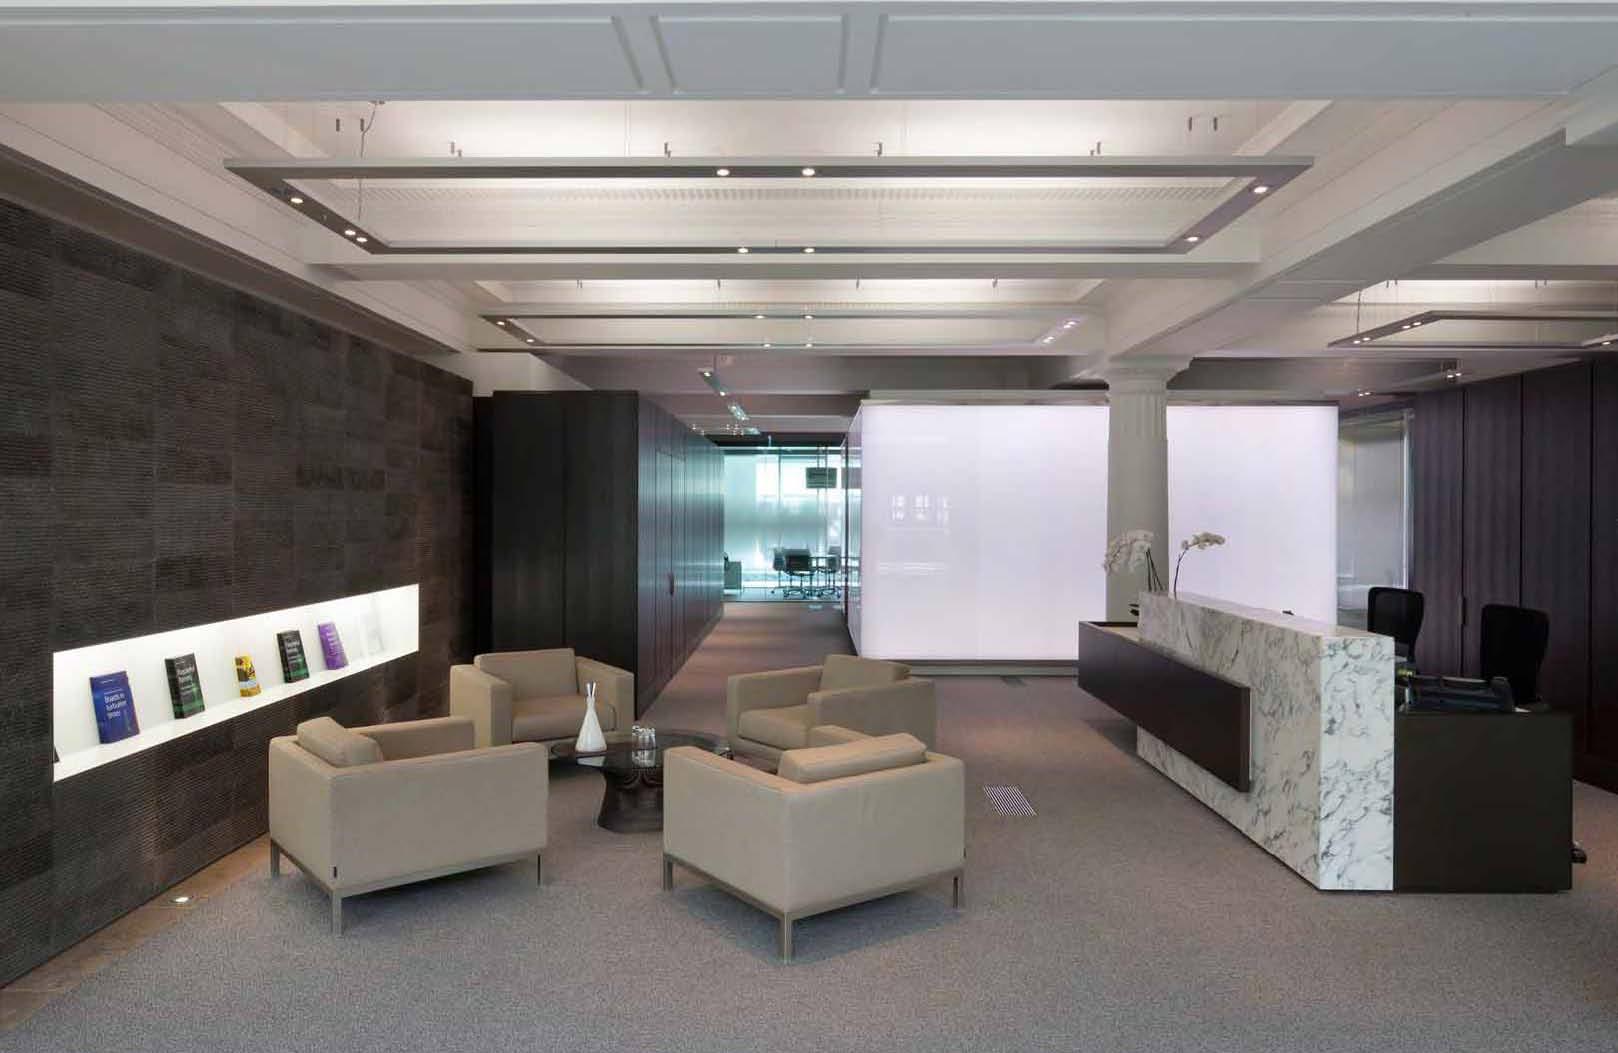 Heidrich & Struggles | Architectural lighting | The Light Lab